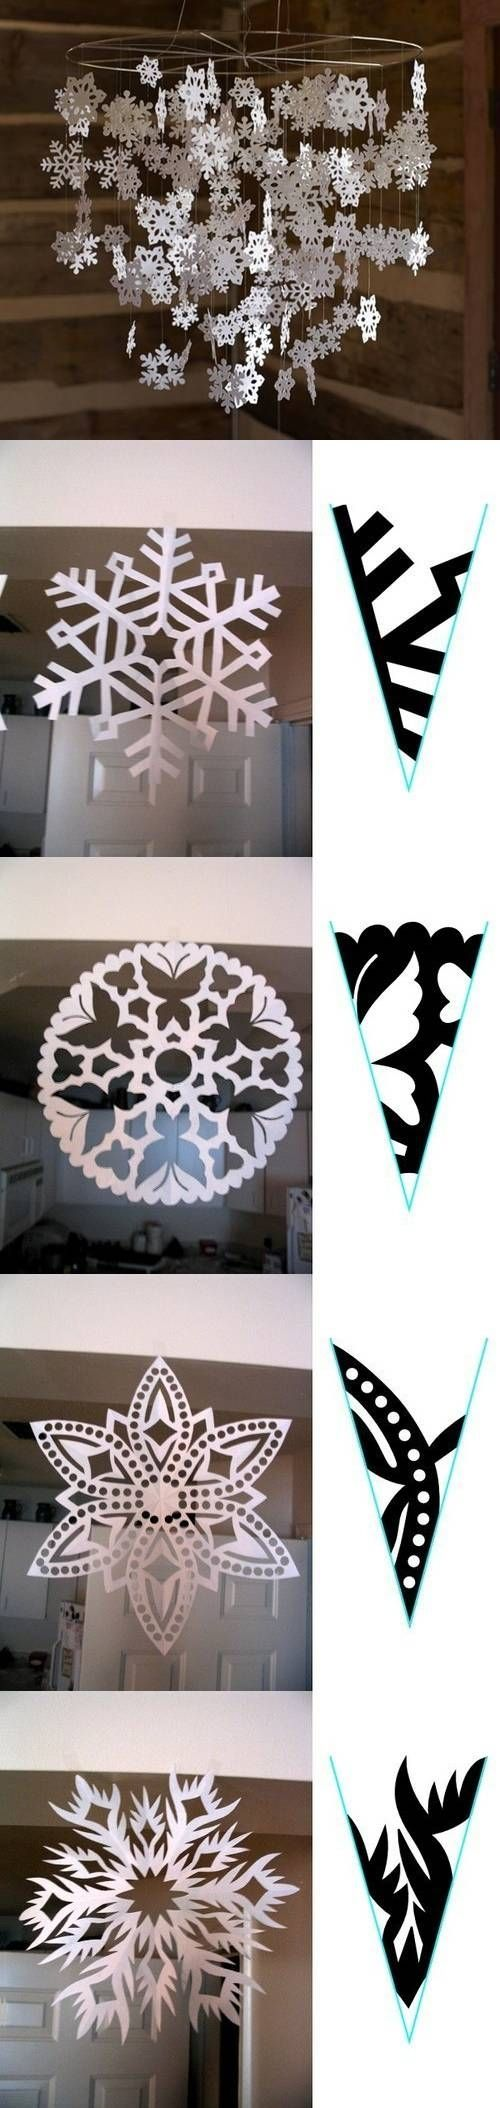 DIY Snowflake Paper Pattern DIY Snowflake Paper Pattern